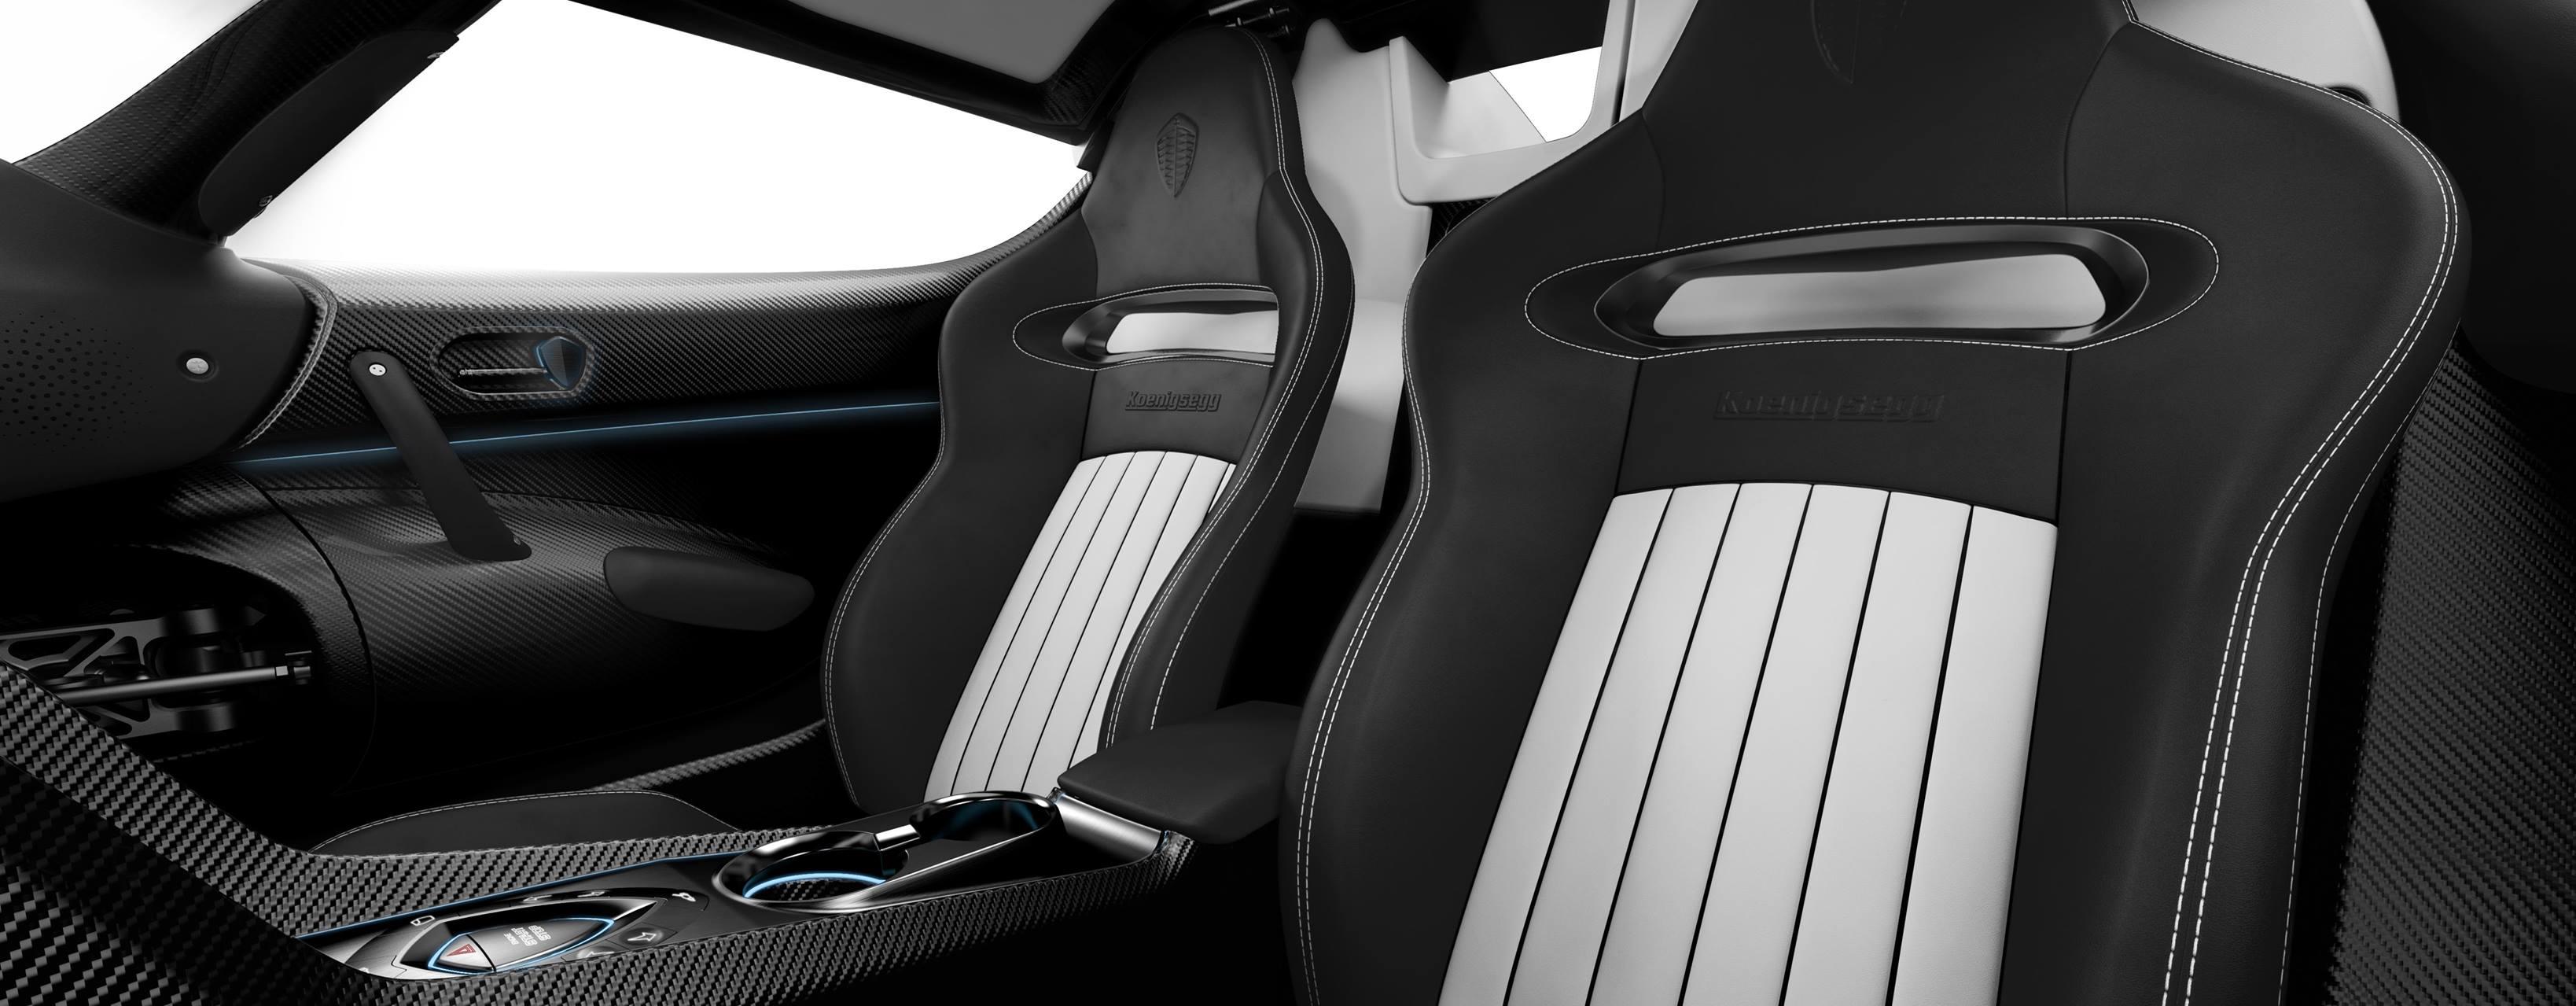 Koenigsegg_Regera_01